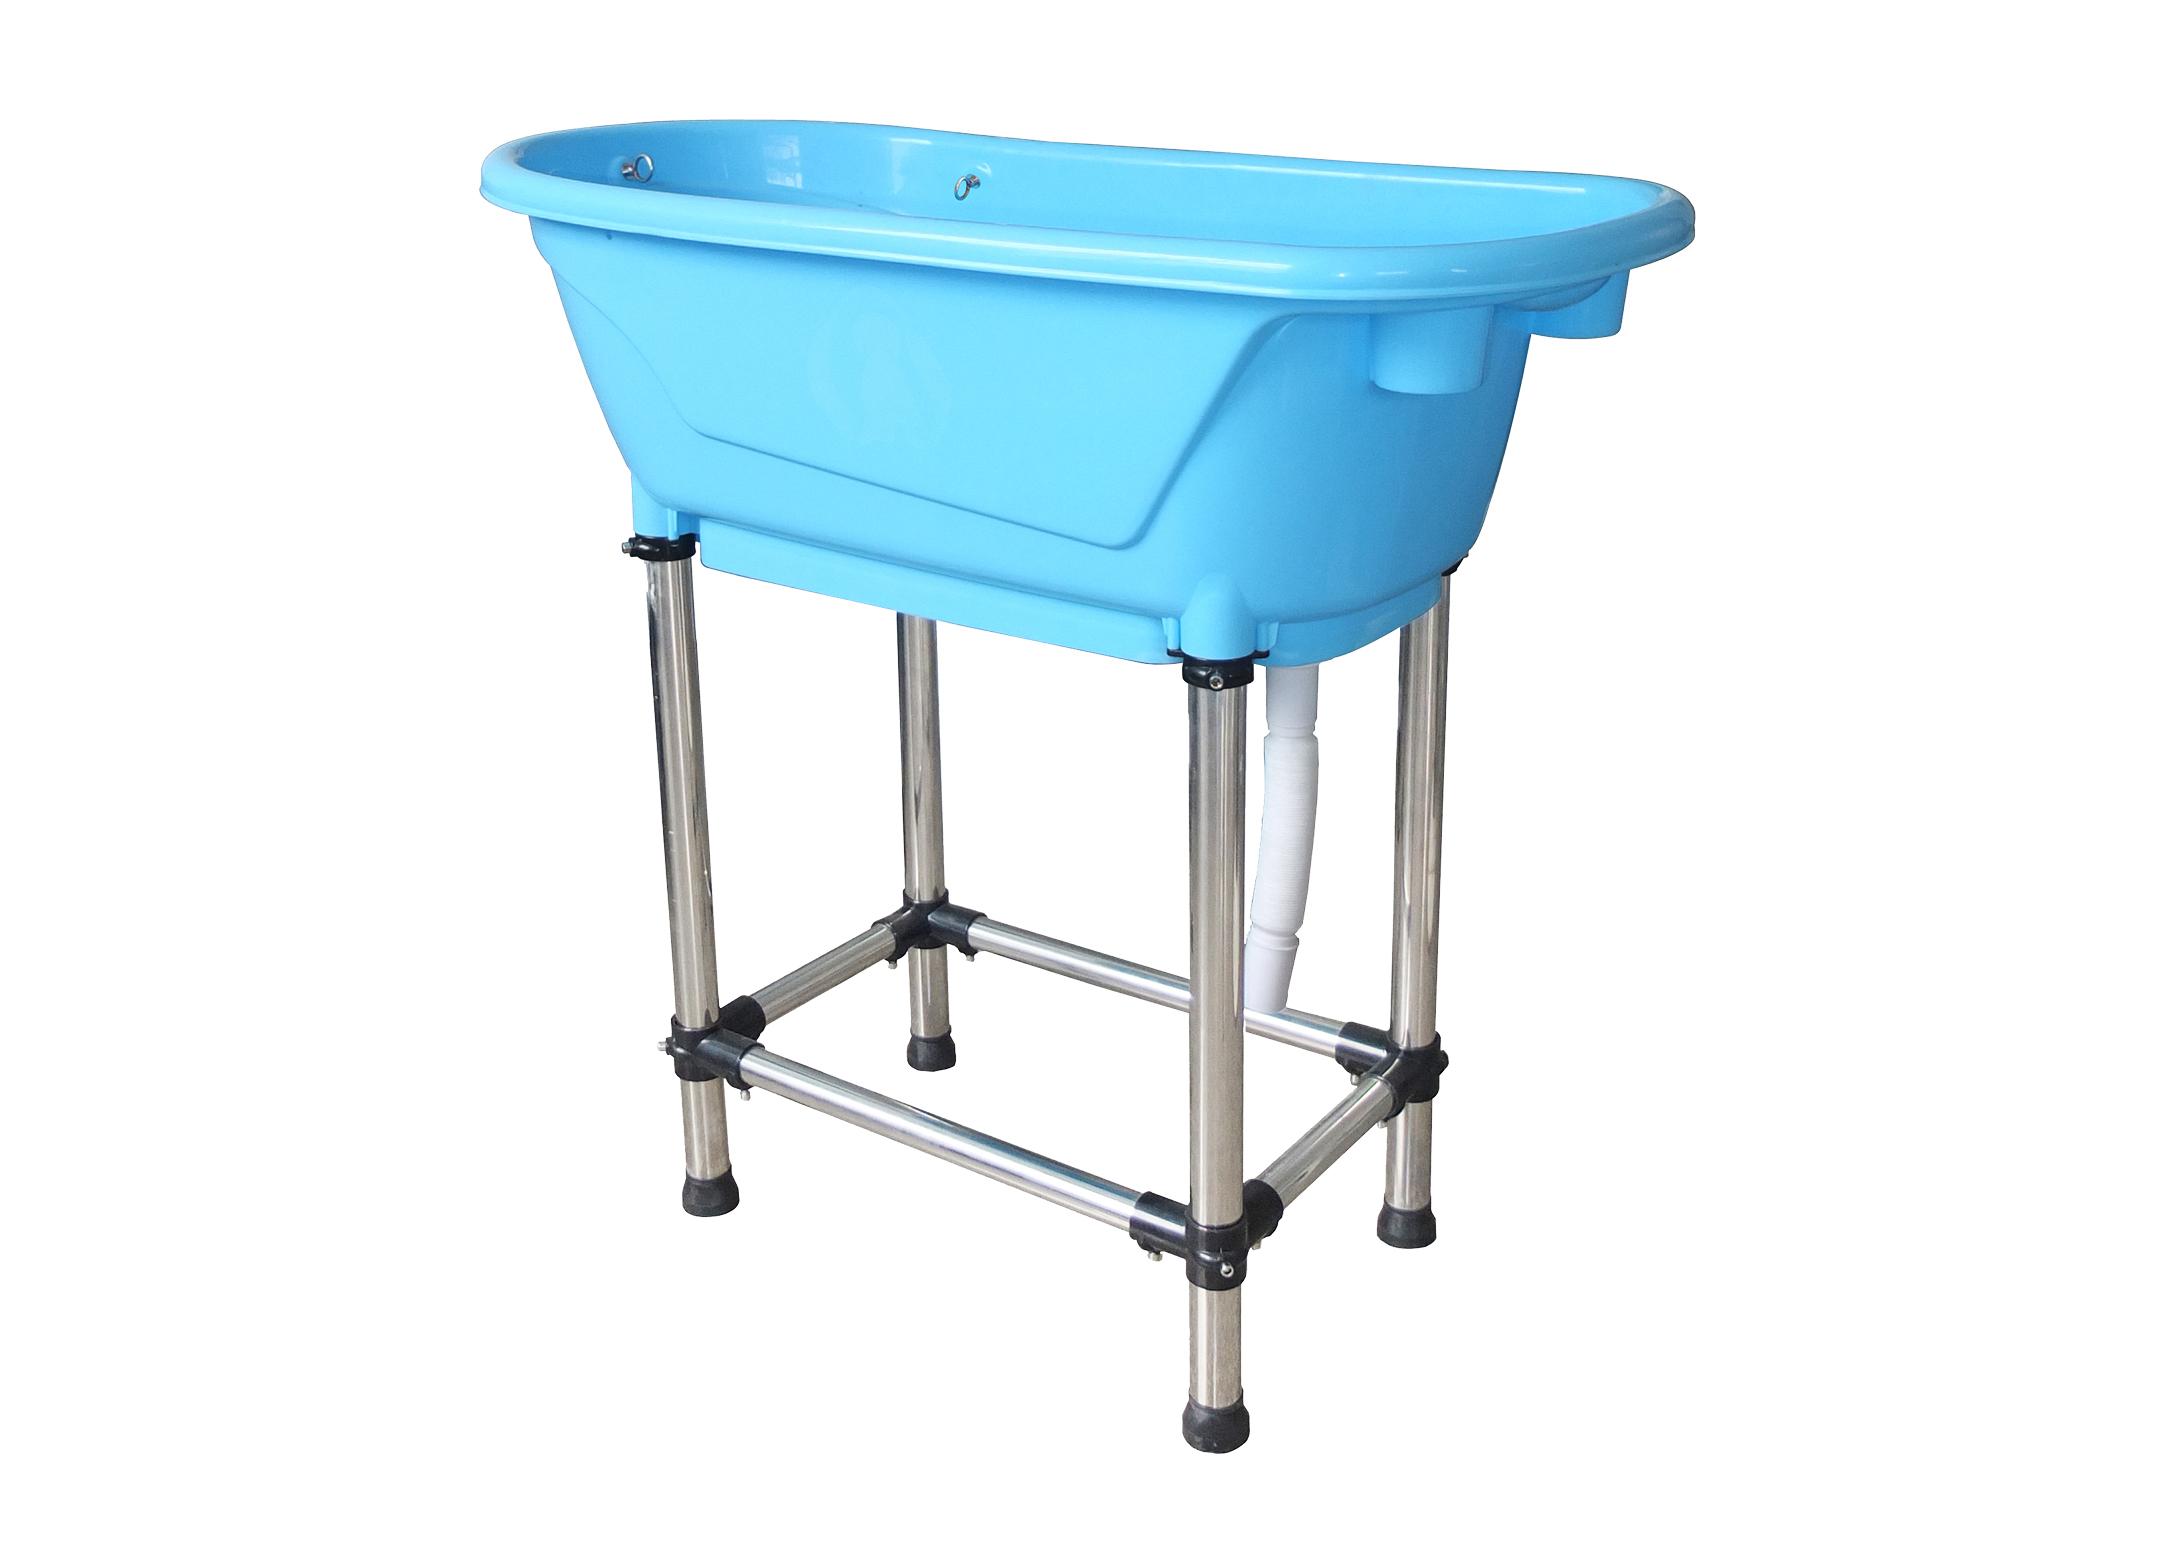 Show Tech Handy Tub M 96x50x91cm Blue Bath